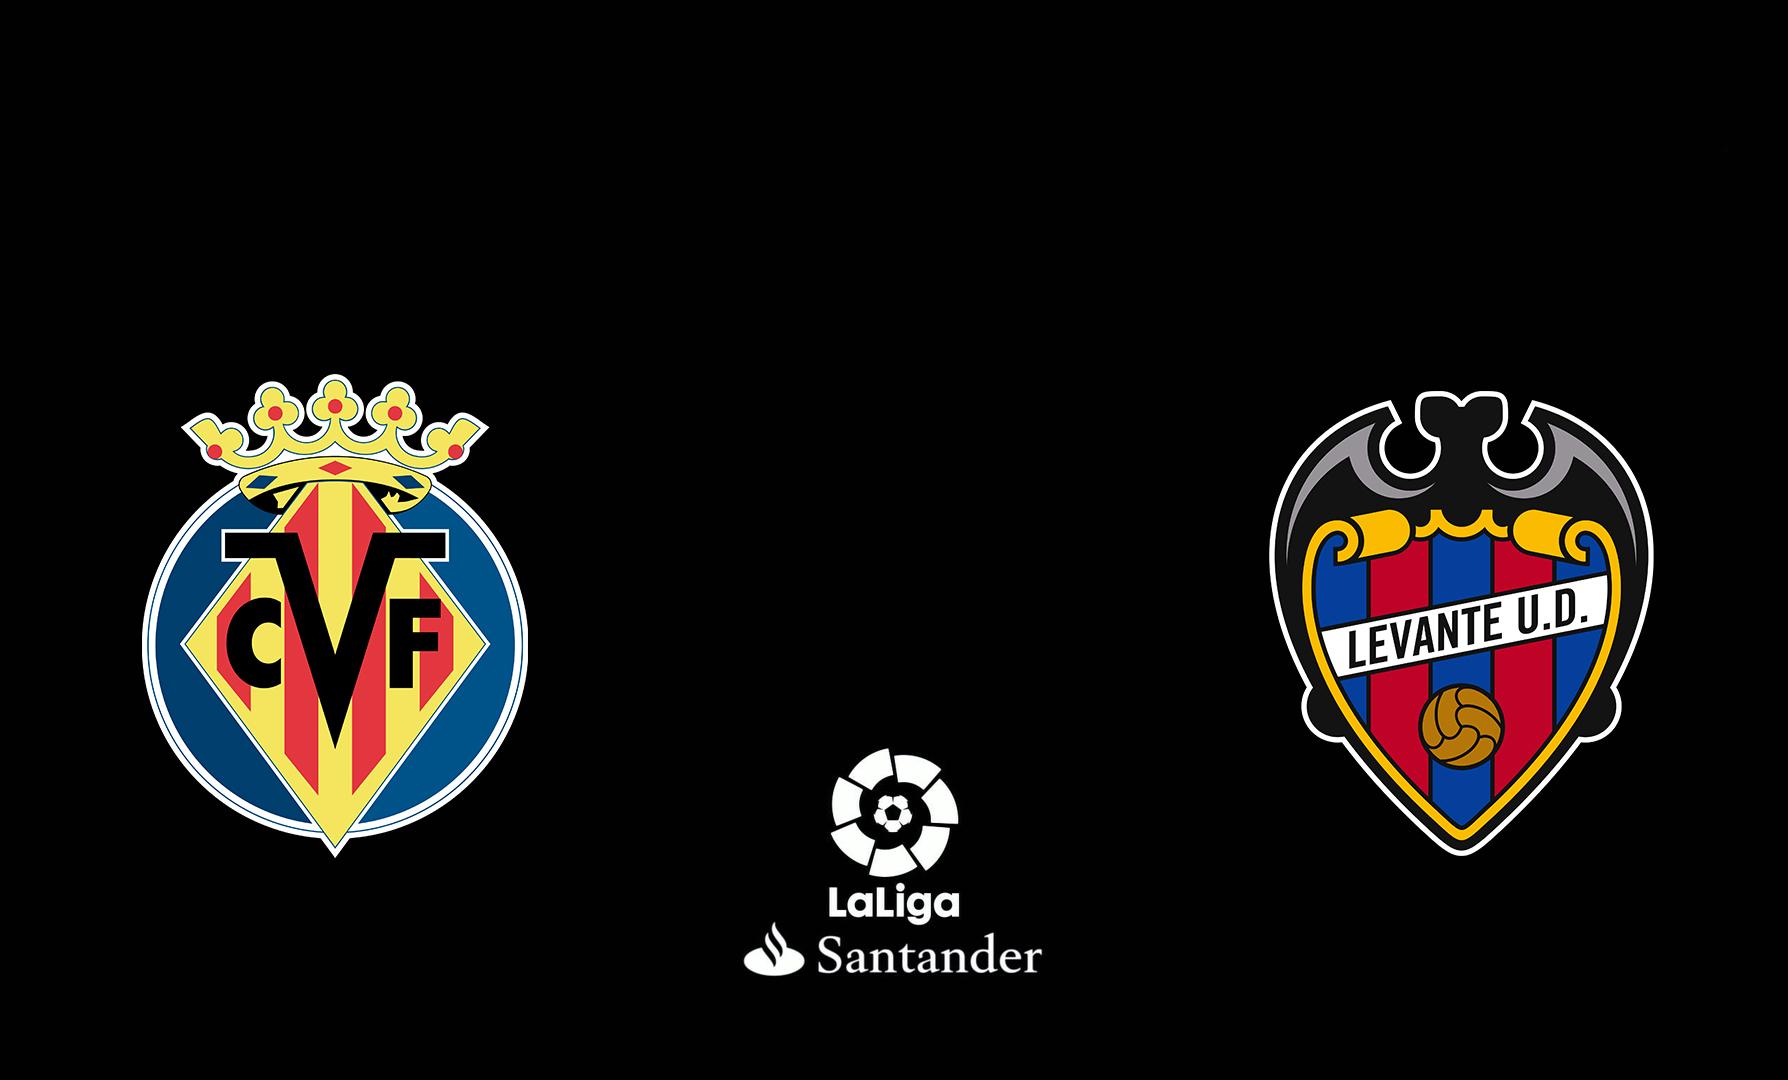 soi-keo-ca-cuoc-bong-da-ngay-9-2-Villarreal-vs-Levante-do-it-thang-do-nhieu-b9 1